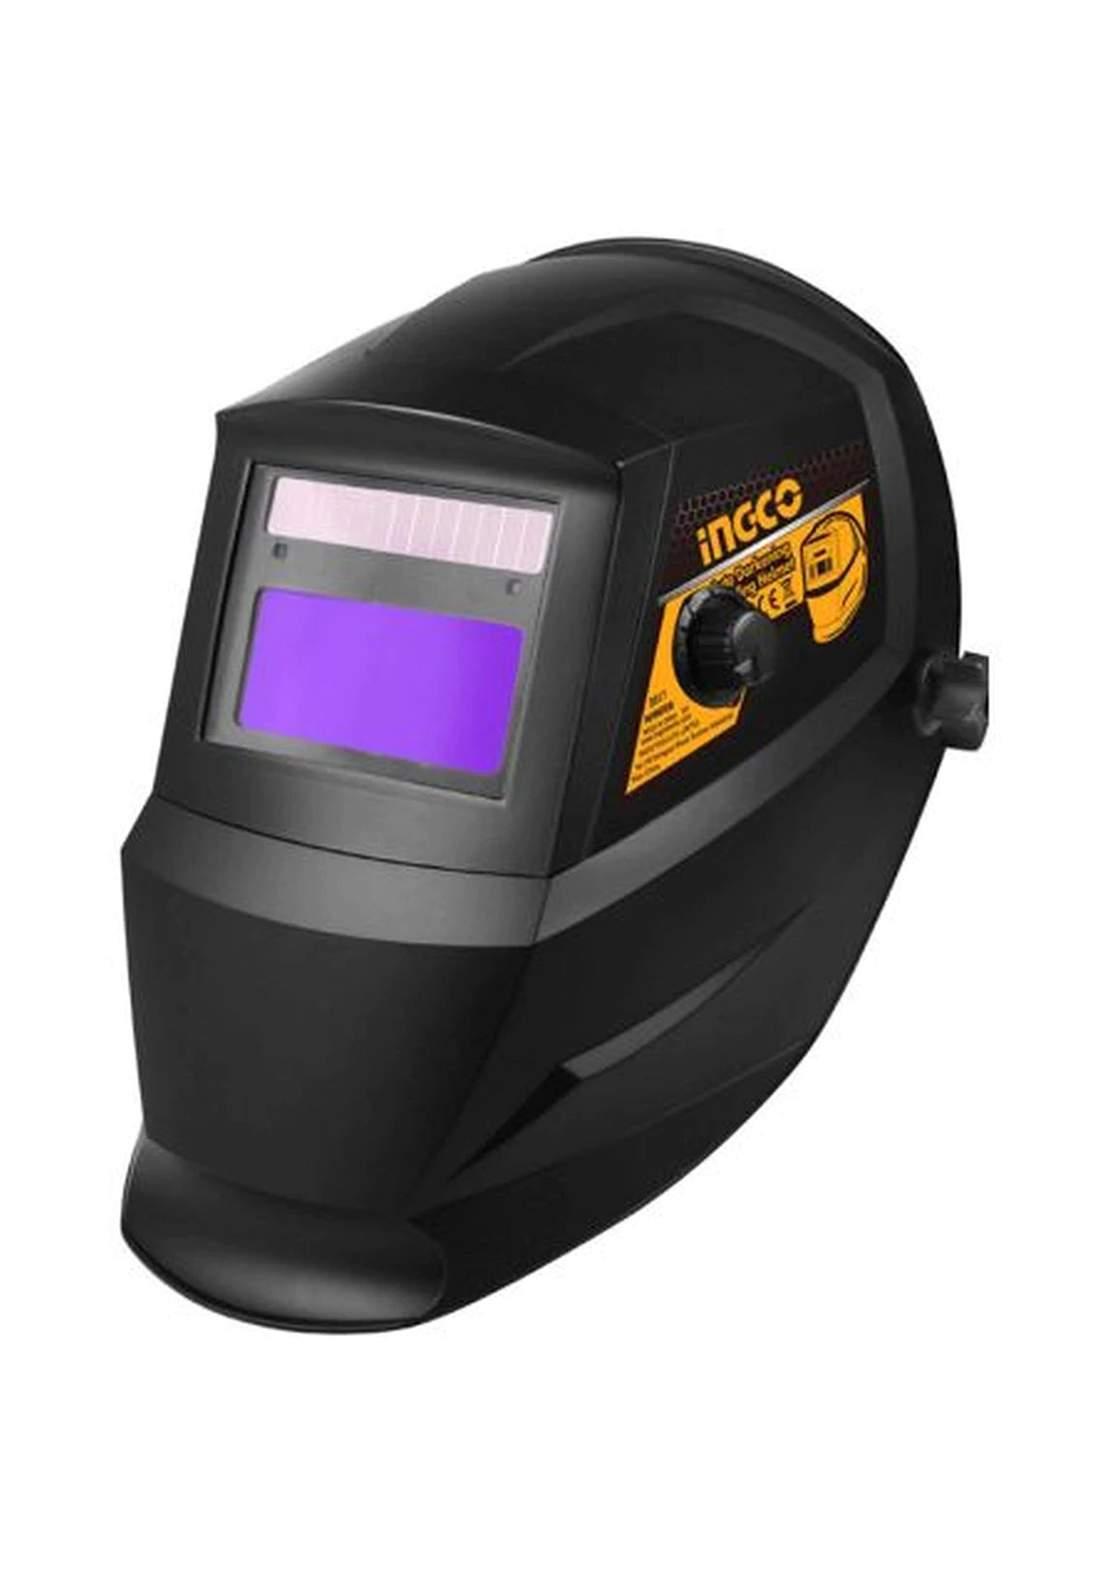 Ingco AHM008 Auto Darkening Welding Helmet قناع لحام